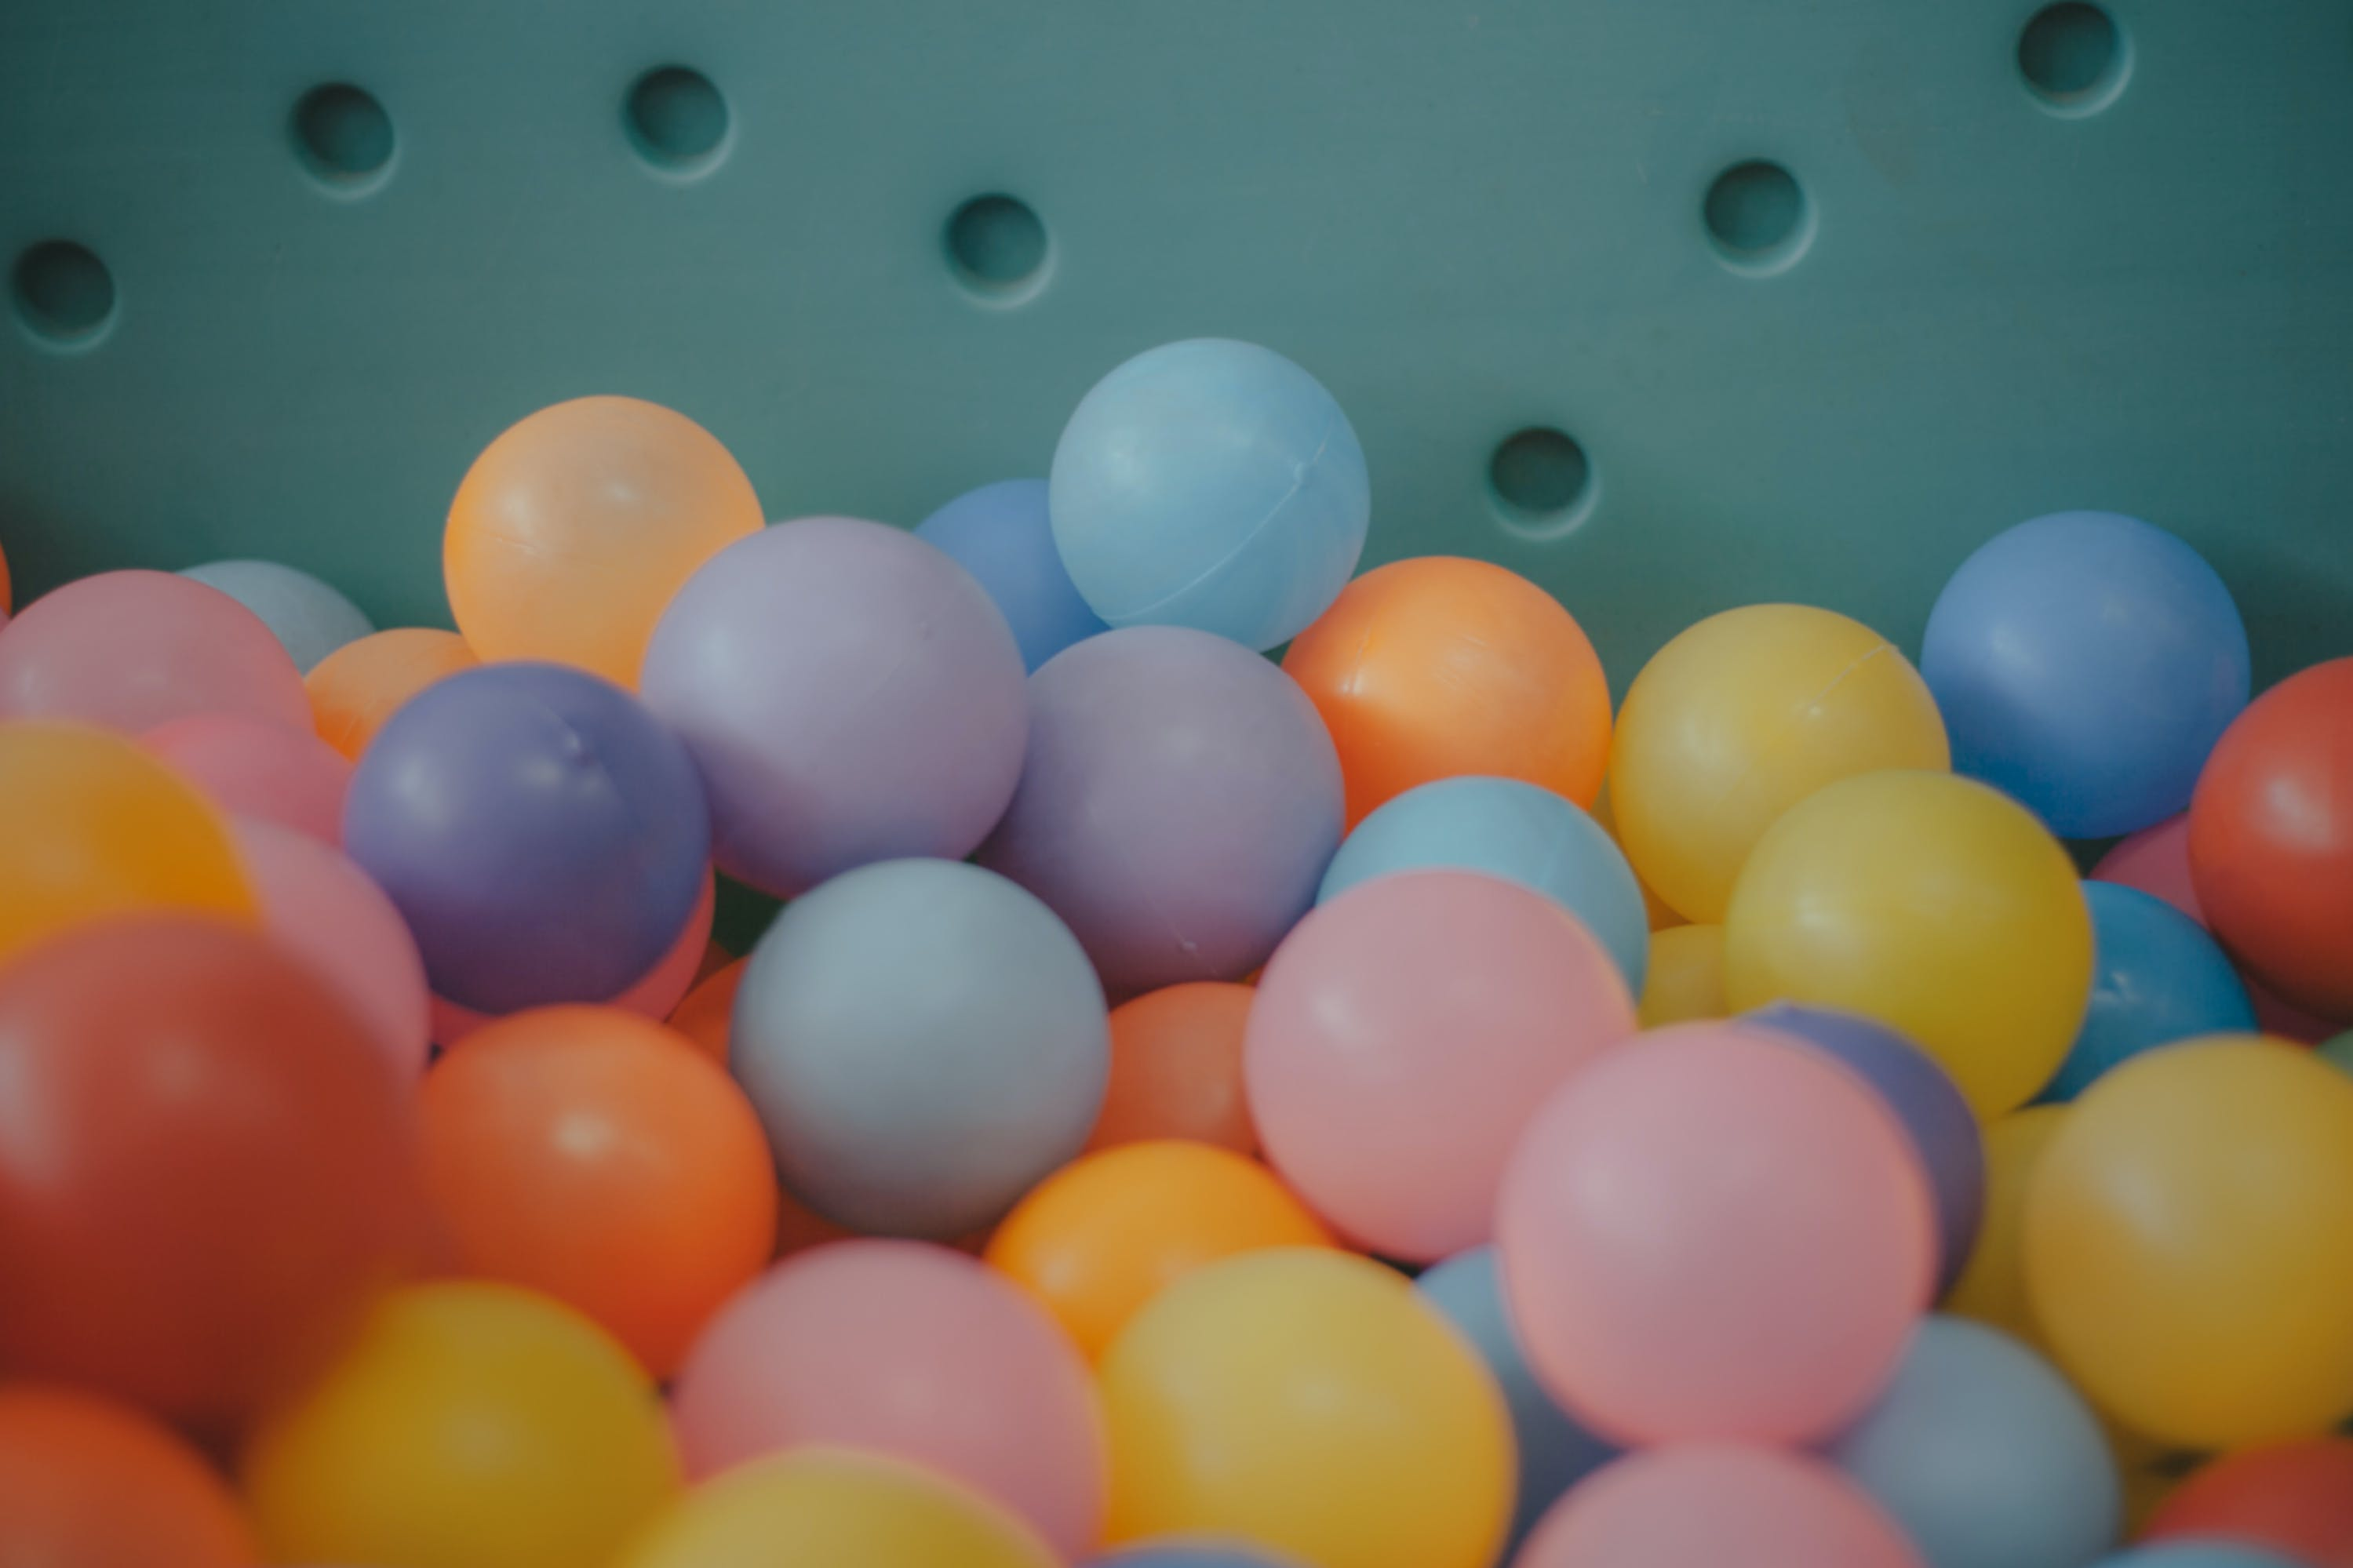 Periksa kebersihan kolam mandi bola, pastikan tidak berdebu dan banyak ceceran makanan di sekitarnya. (Foto: Pexels)